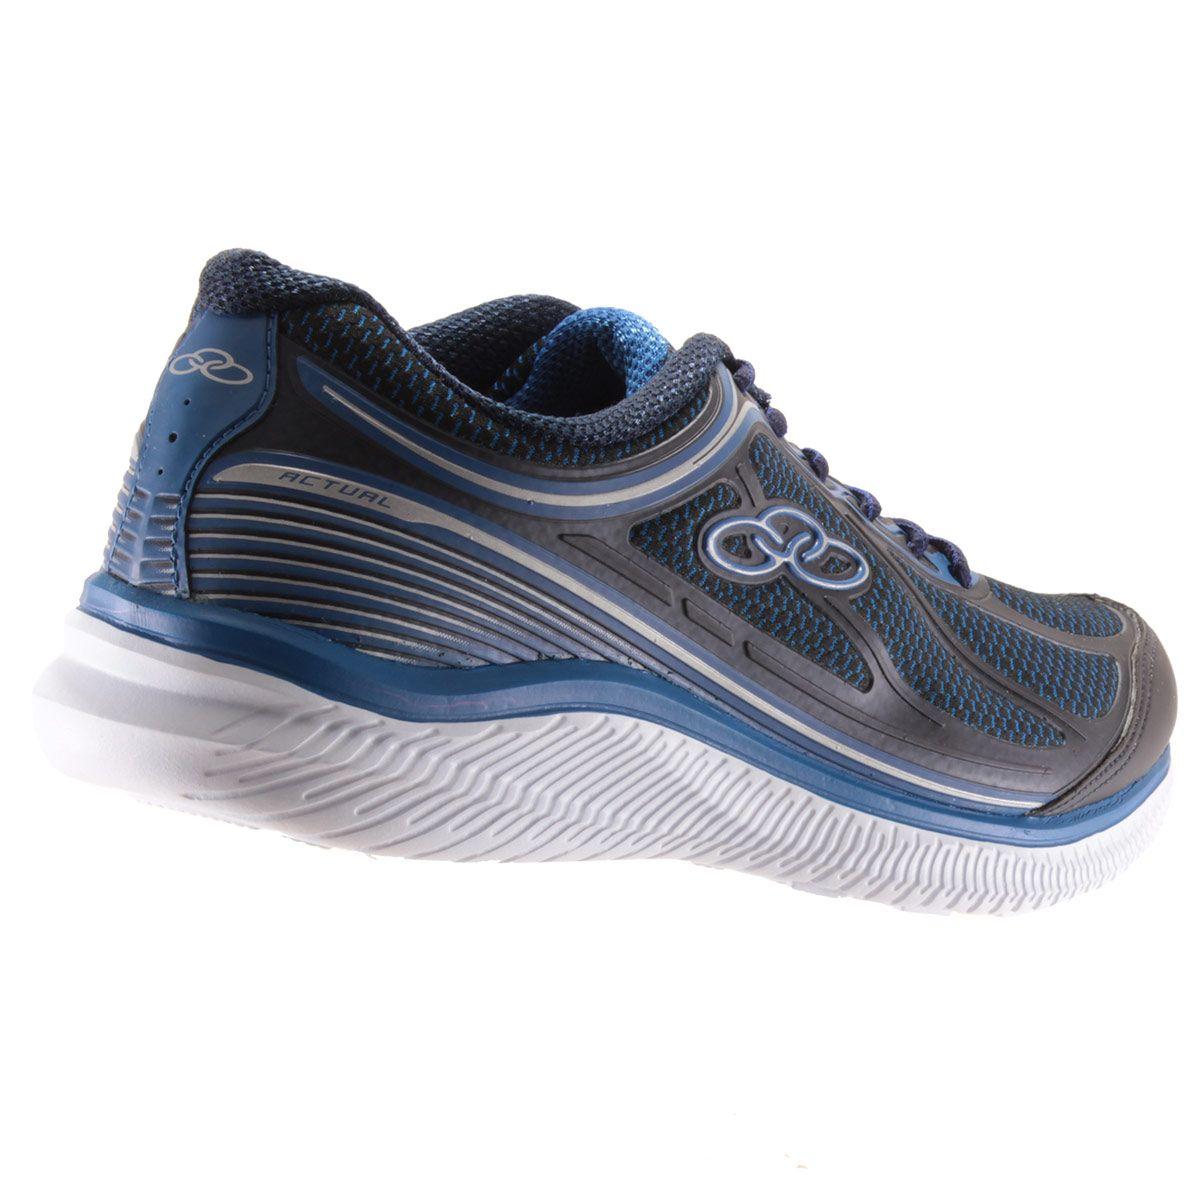 Tênis Olympikus Actual Masculino Caminhada Corrida 422   - Ian Calçados